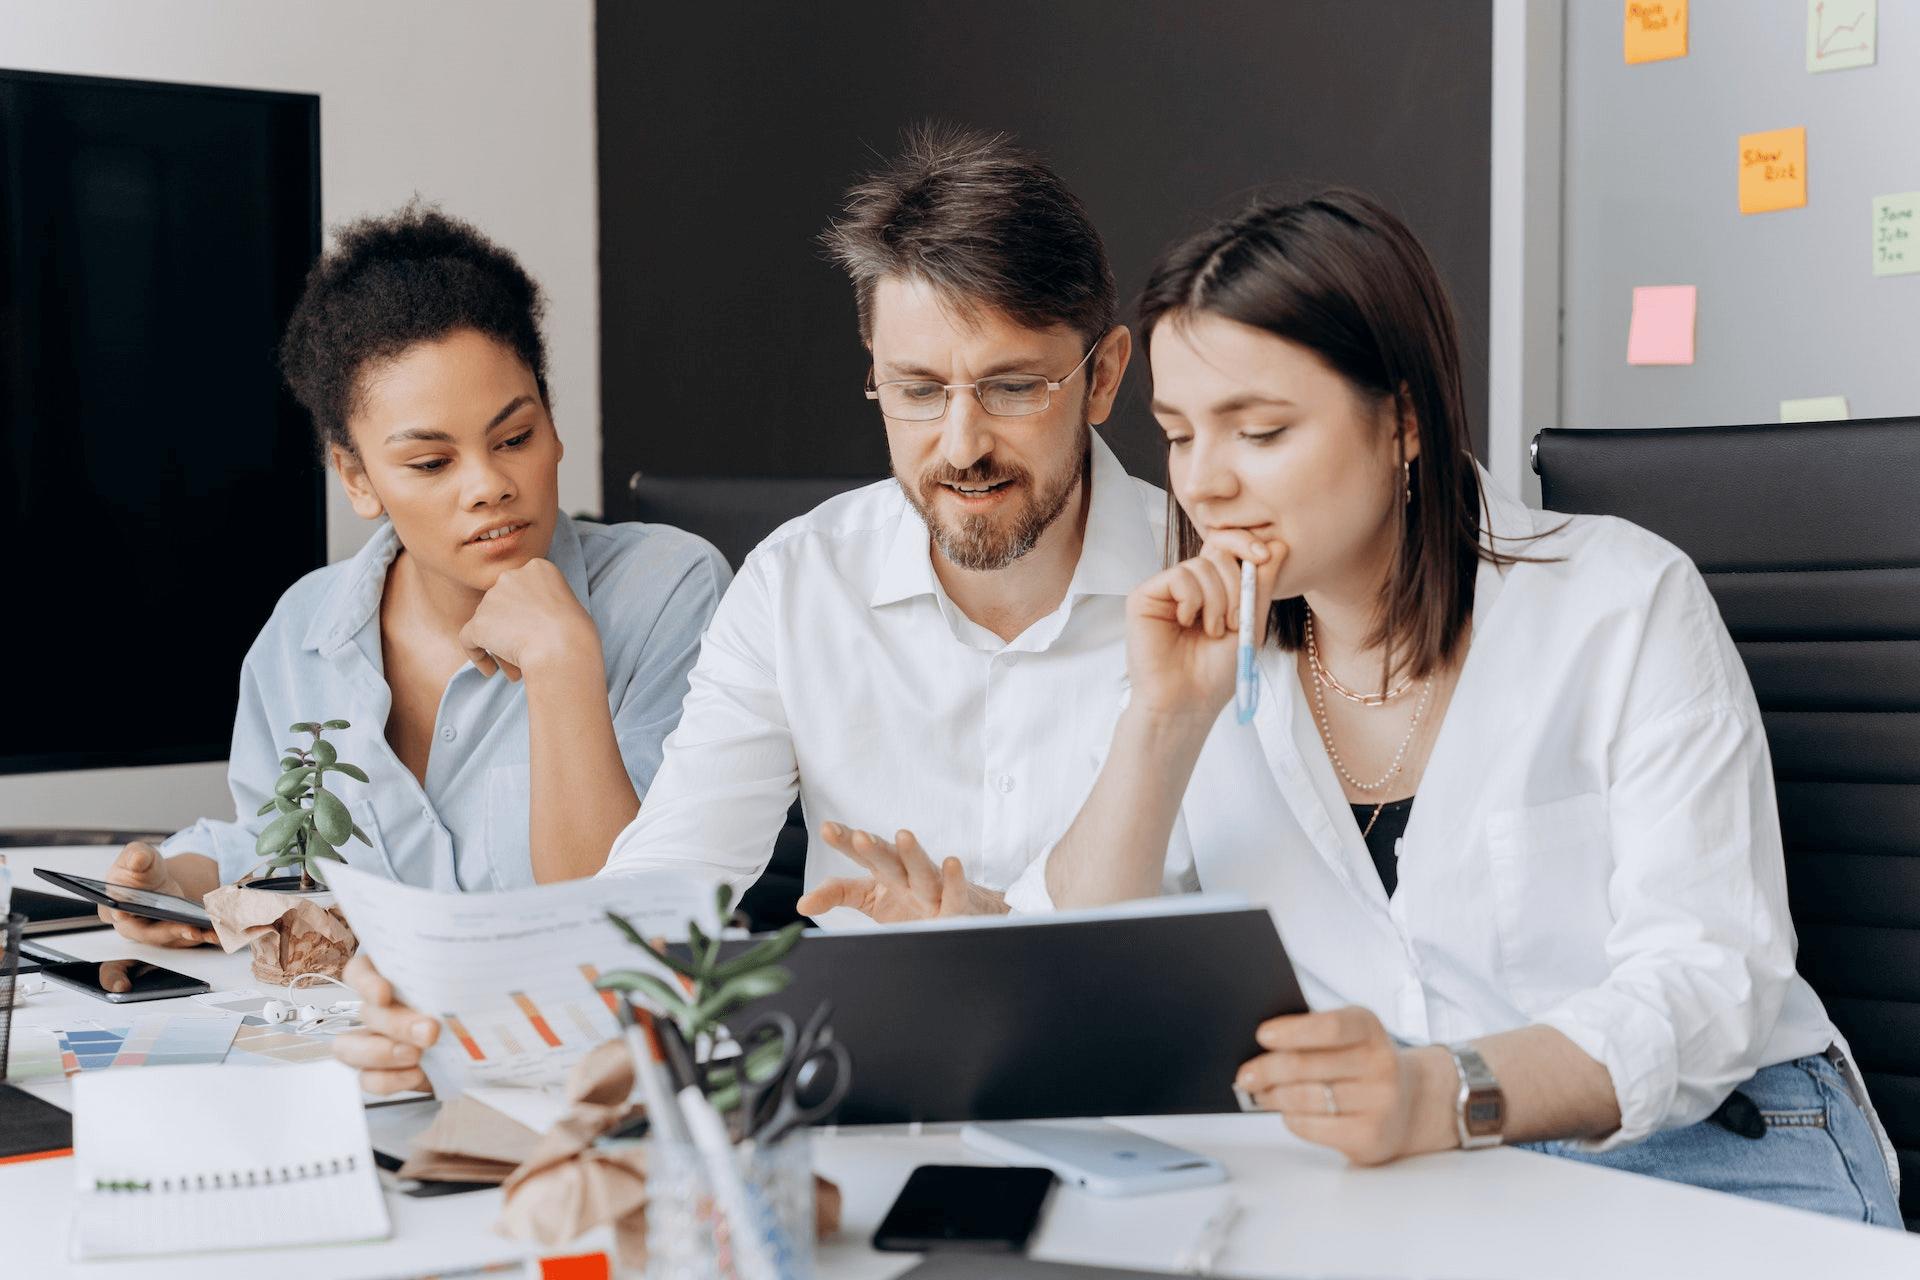 Key Performance Indicators (KPIs)